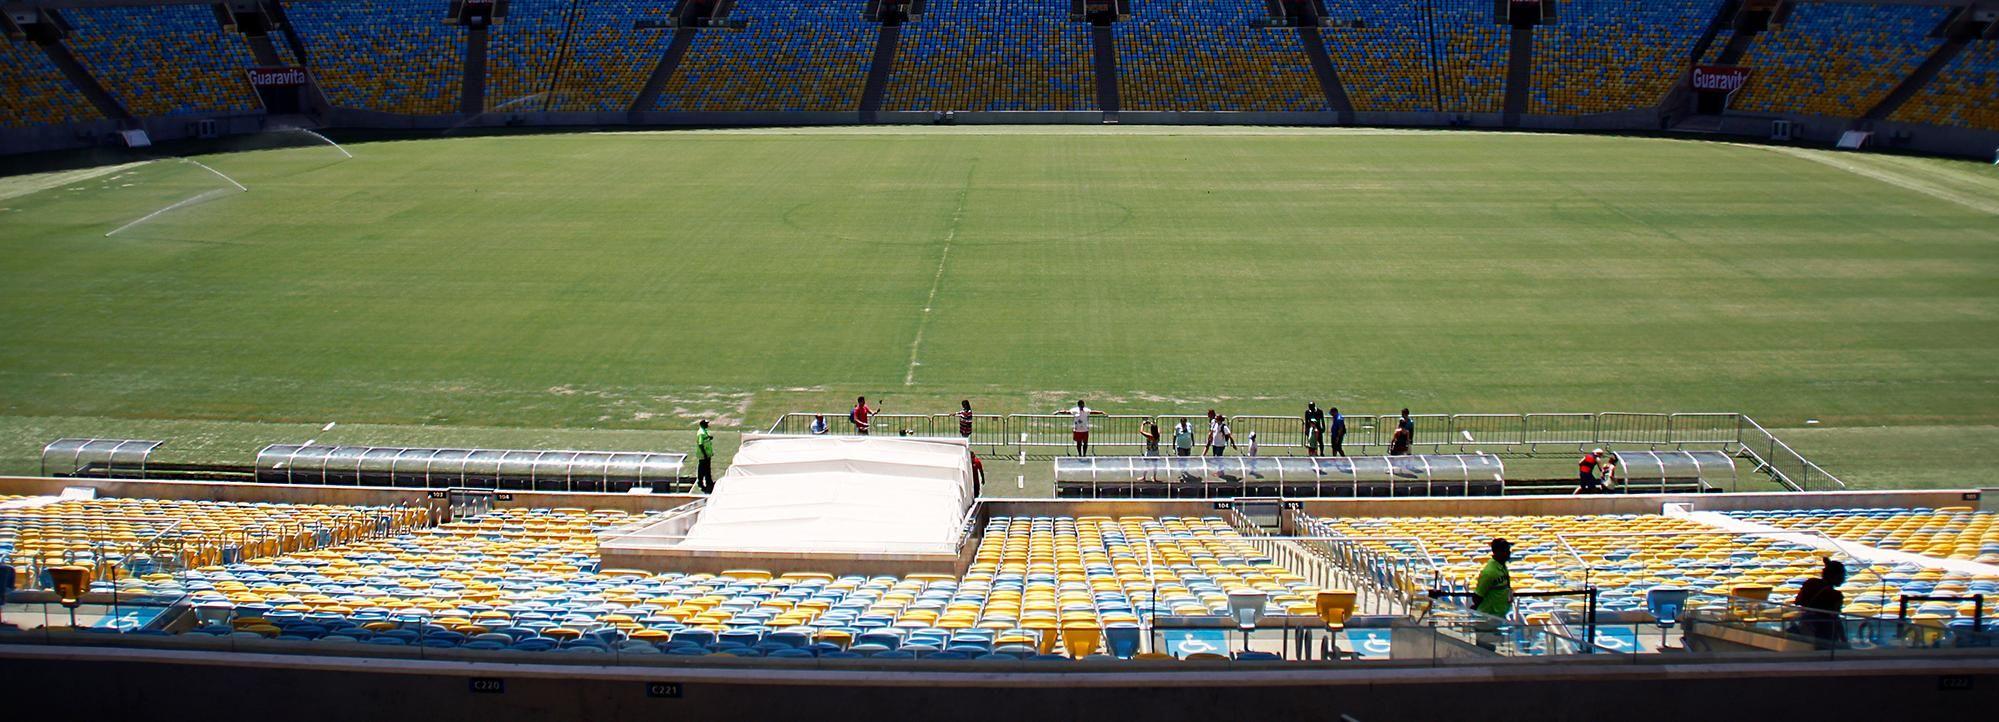 Estadio de Maracaná: tour de 3 h entre bastidores